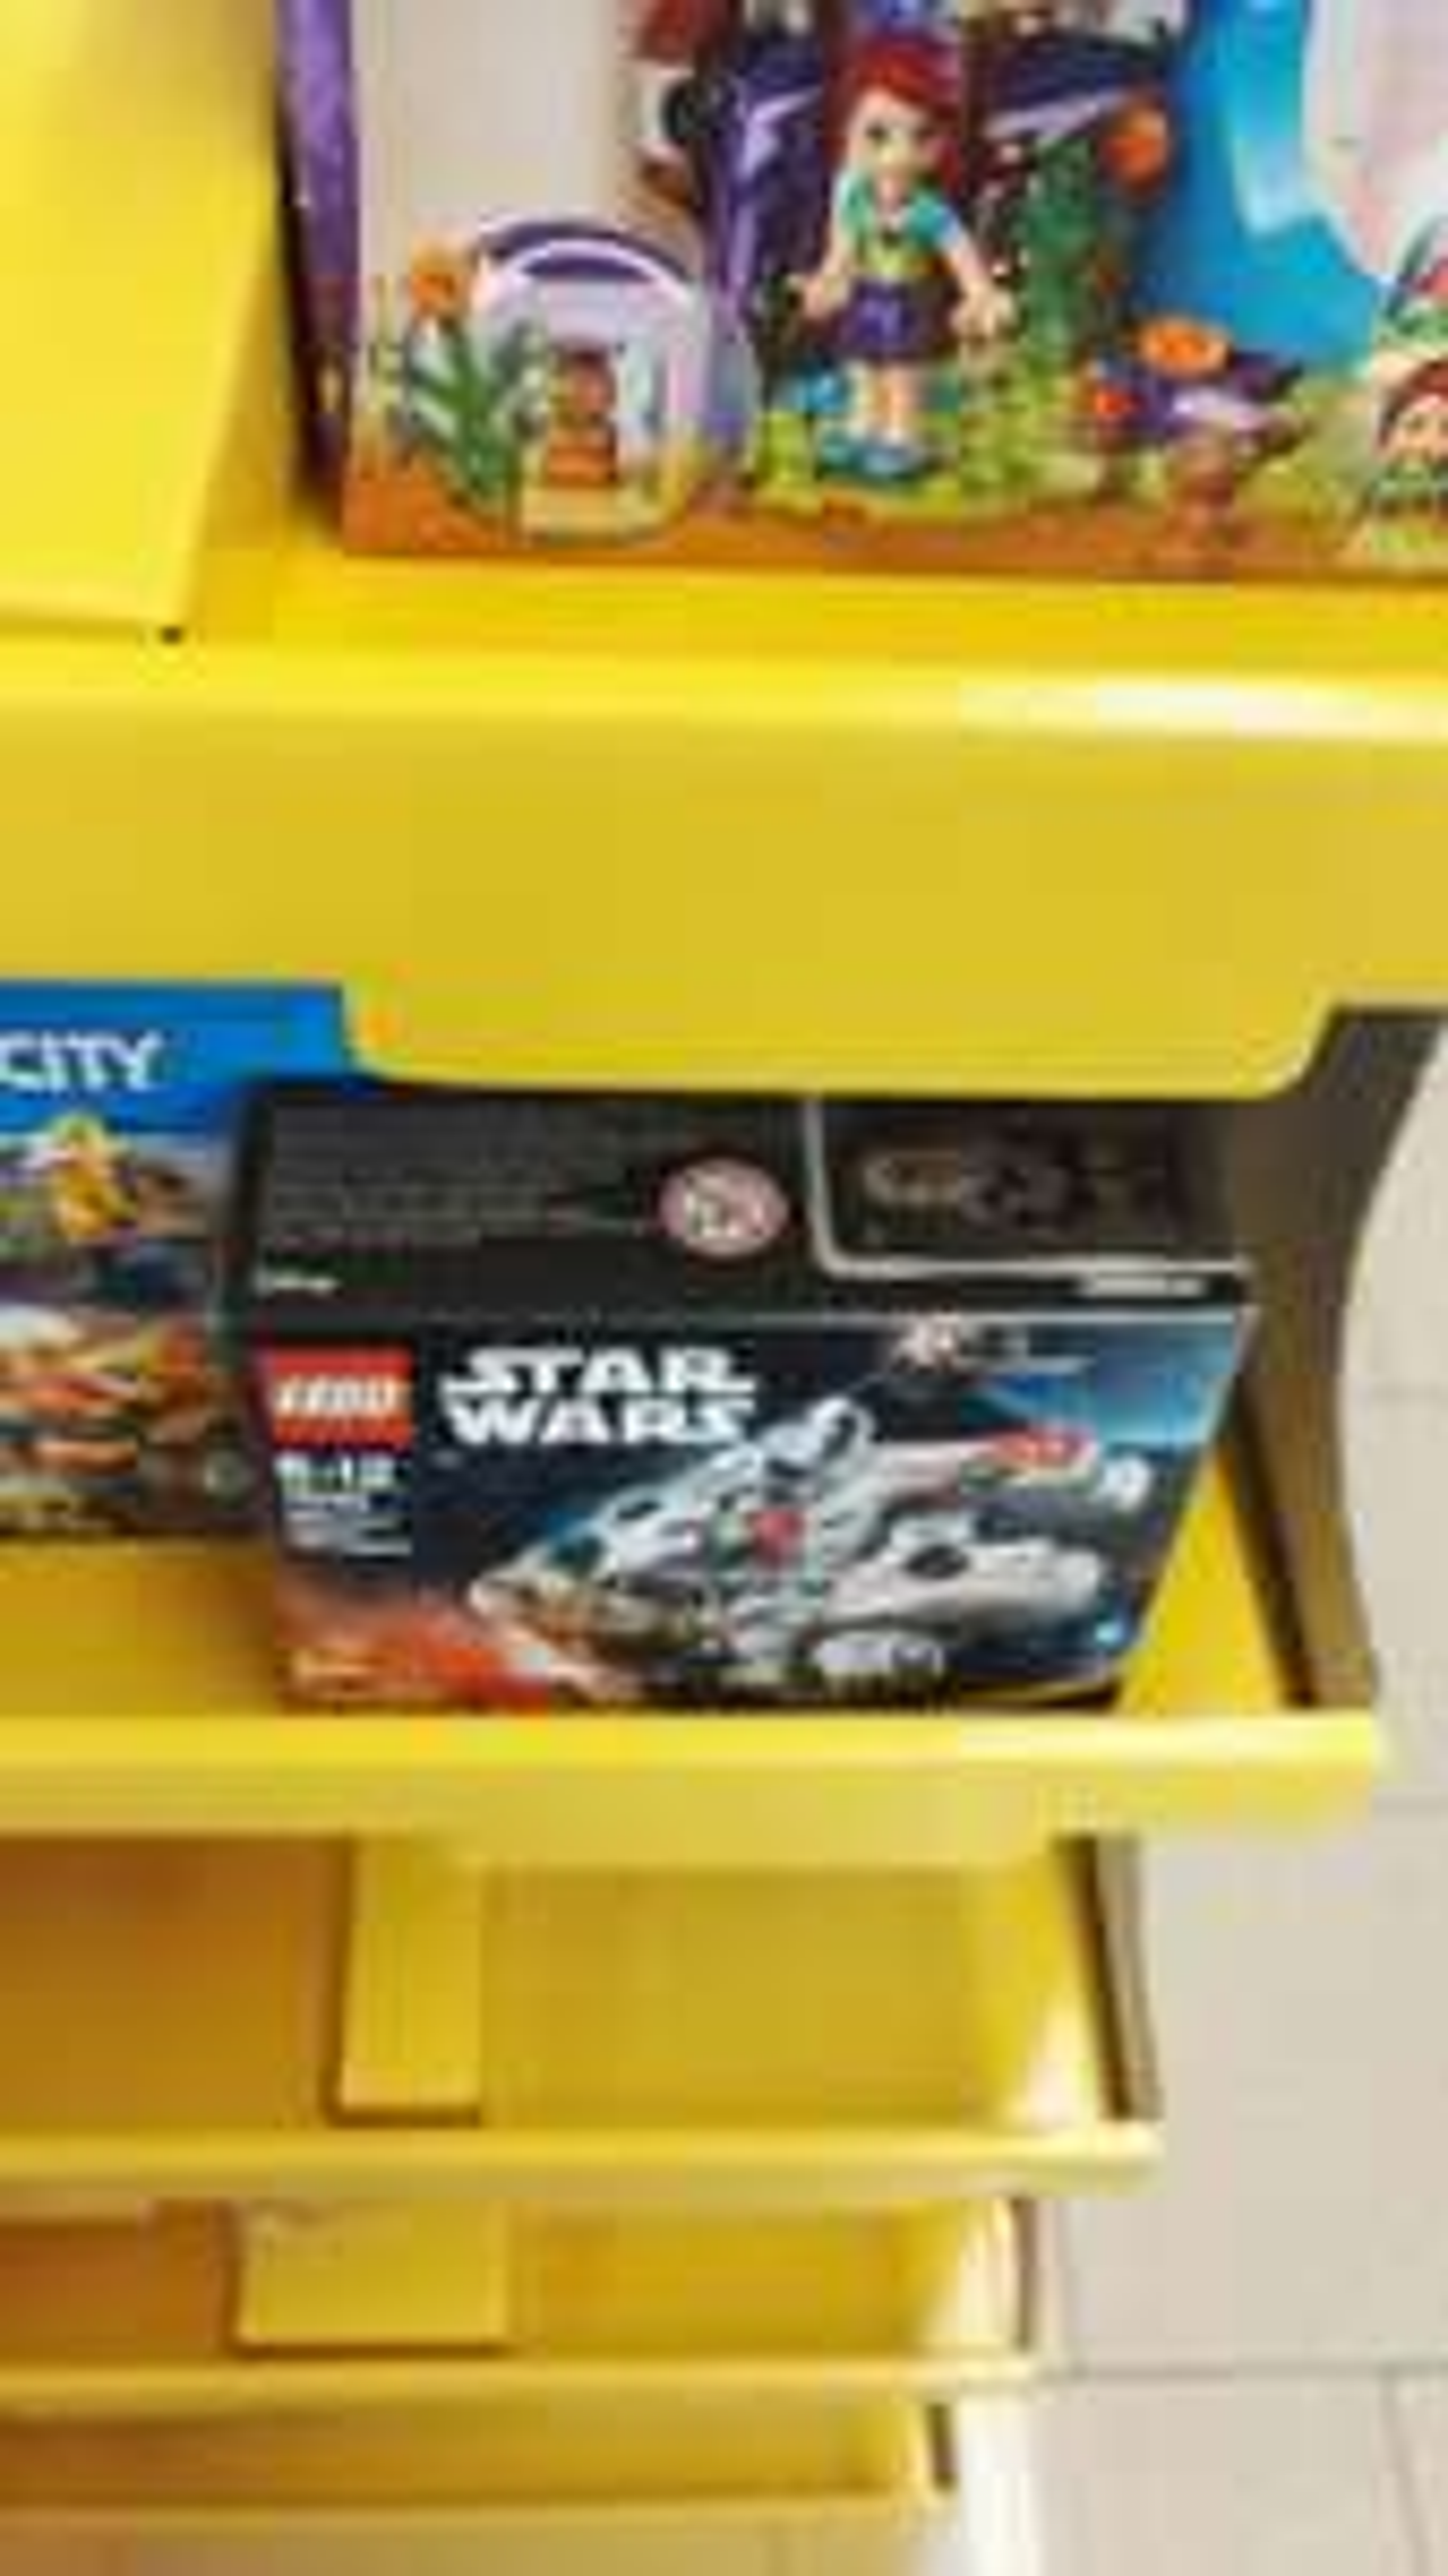 Lego Millenium Falcon Microfighter (mit Chewbacca) 75193 [Rewe, u.a. Bad Endorf]